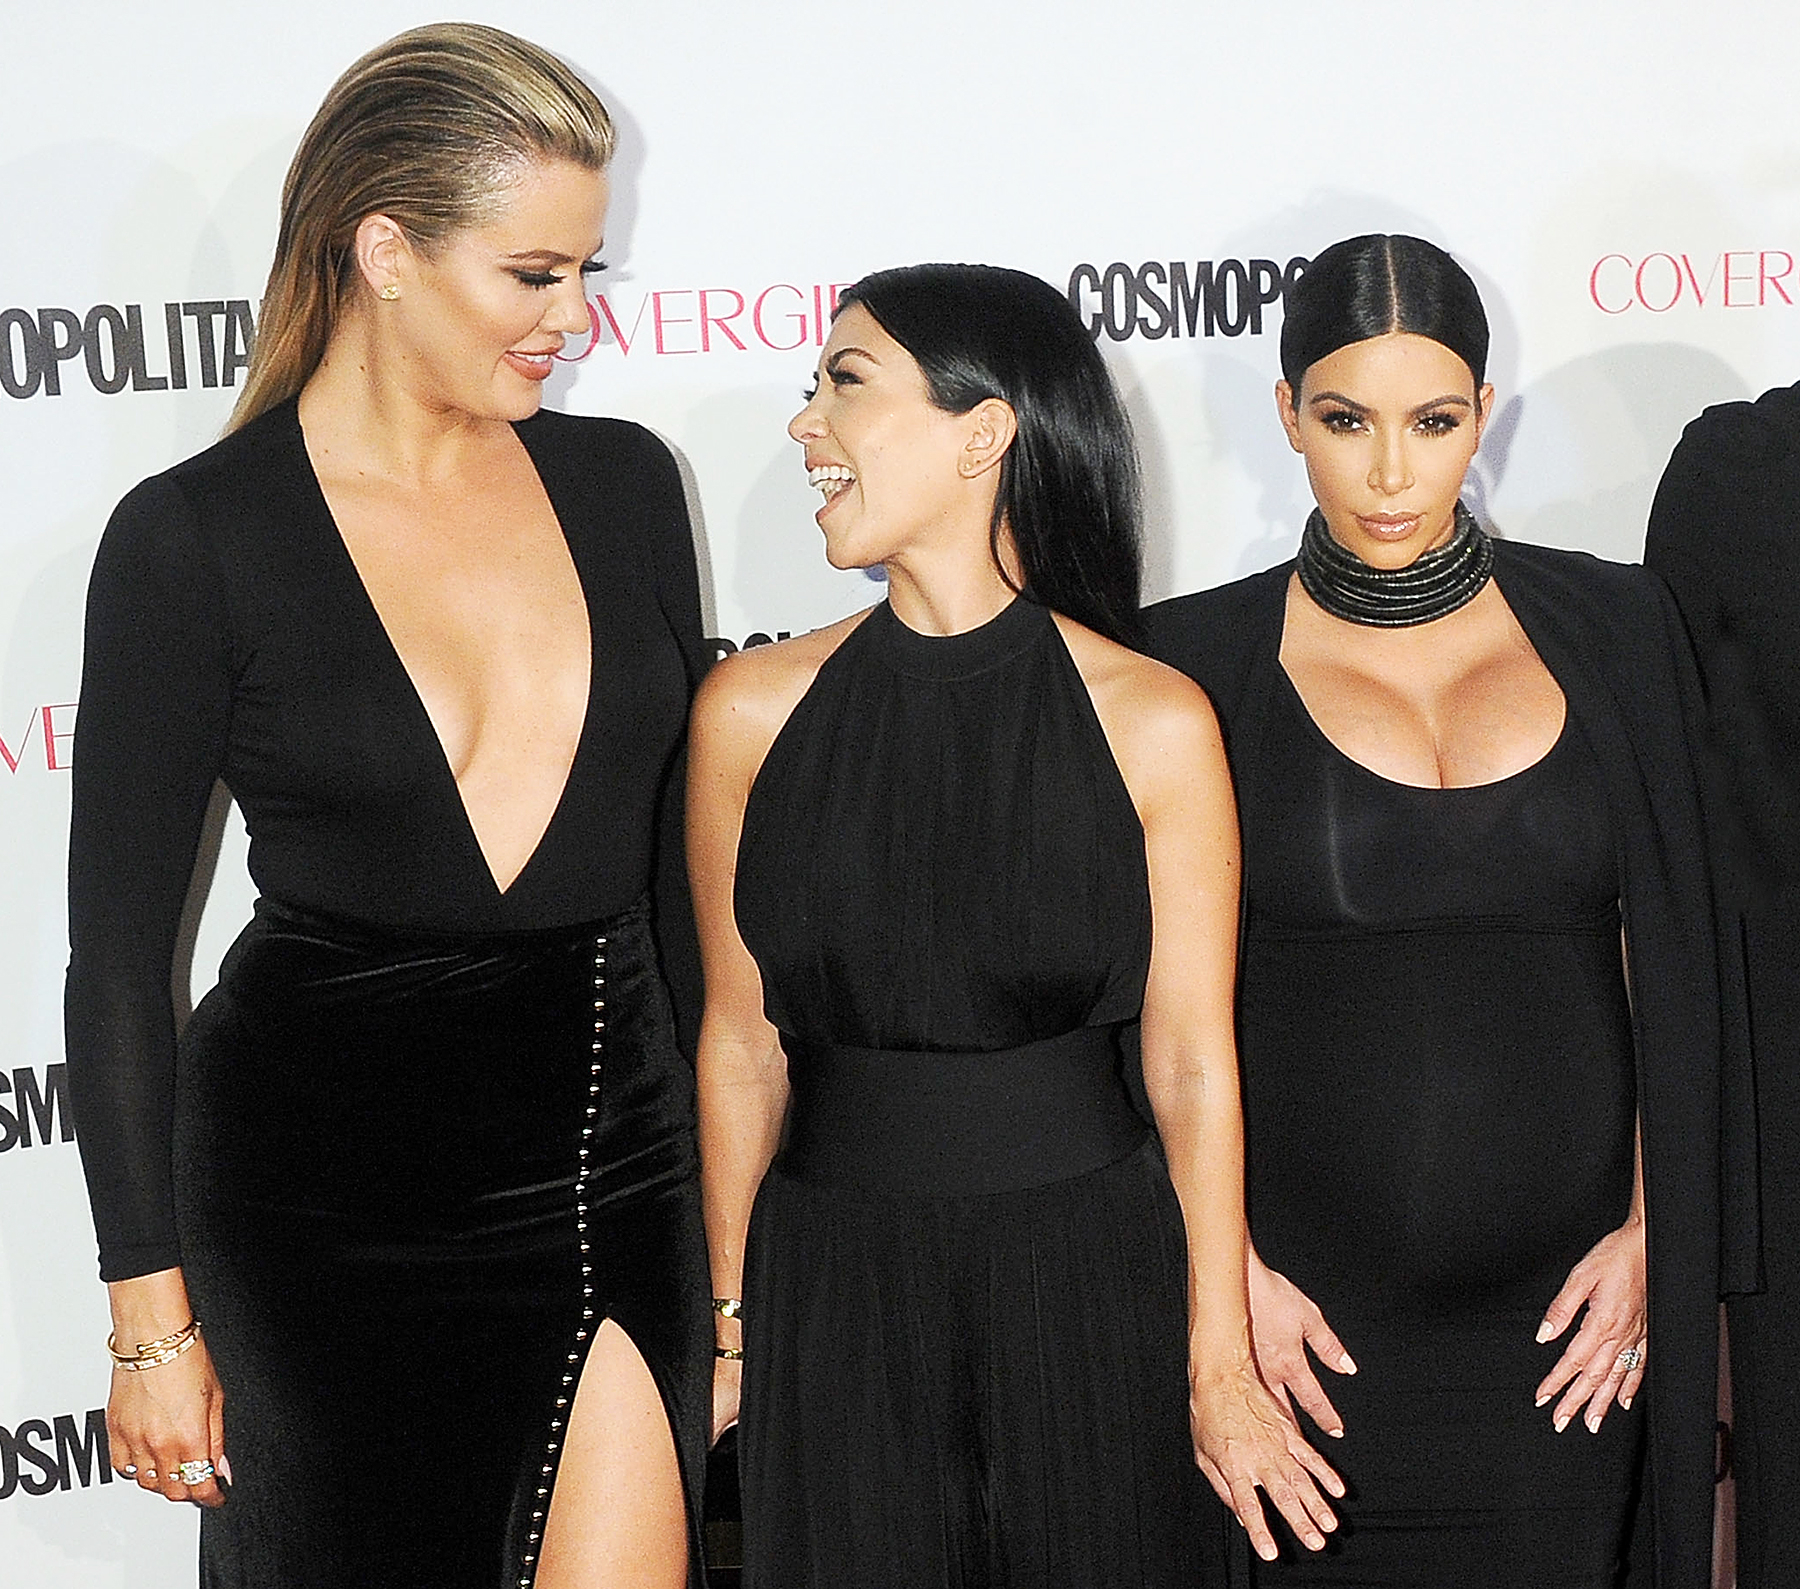 b289e0e2aae1 Kourtney Kardashian on Fighting With Sisters: Kim Gives 'Little Digs'